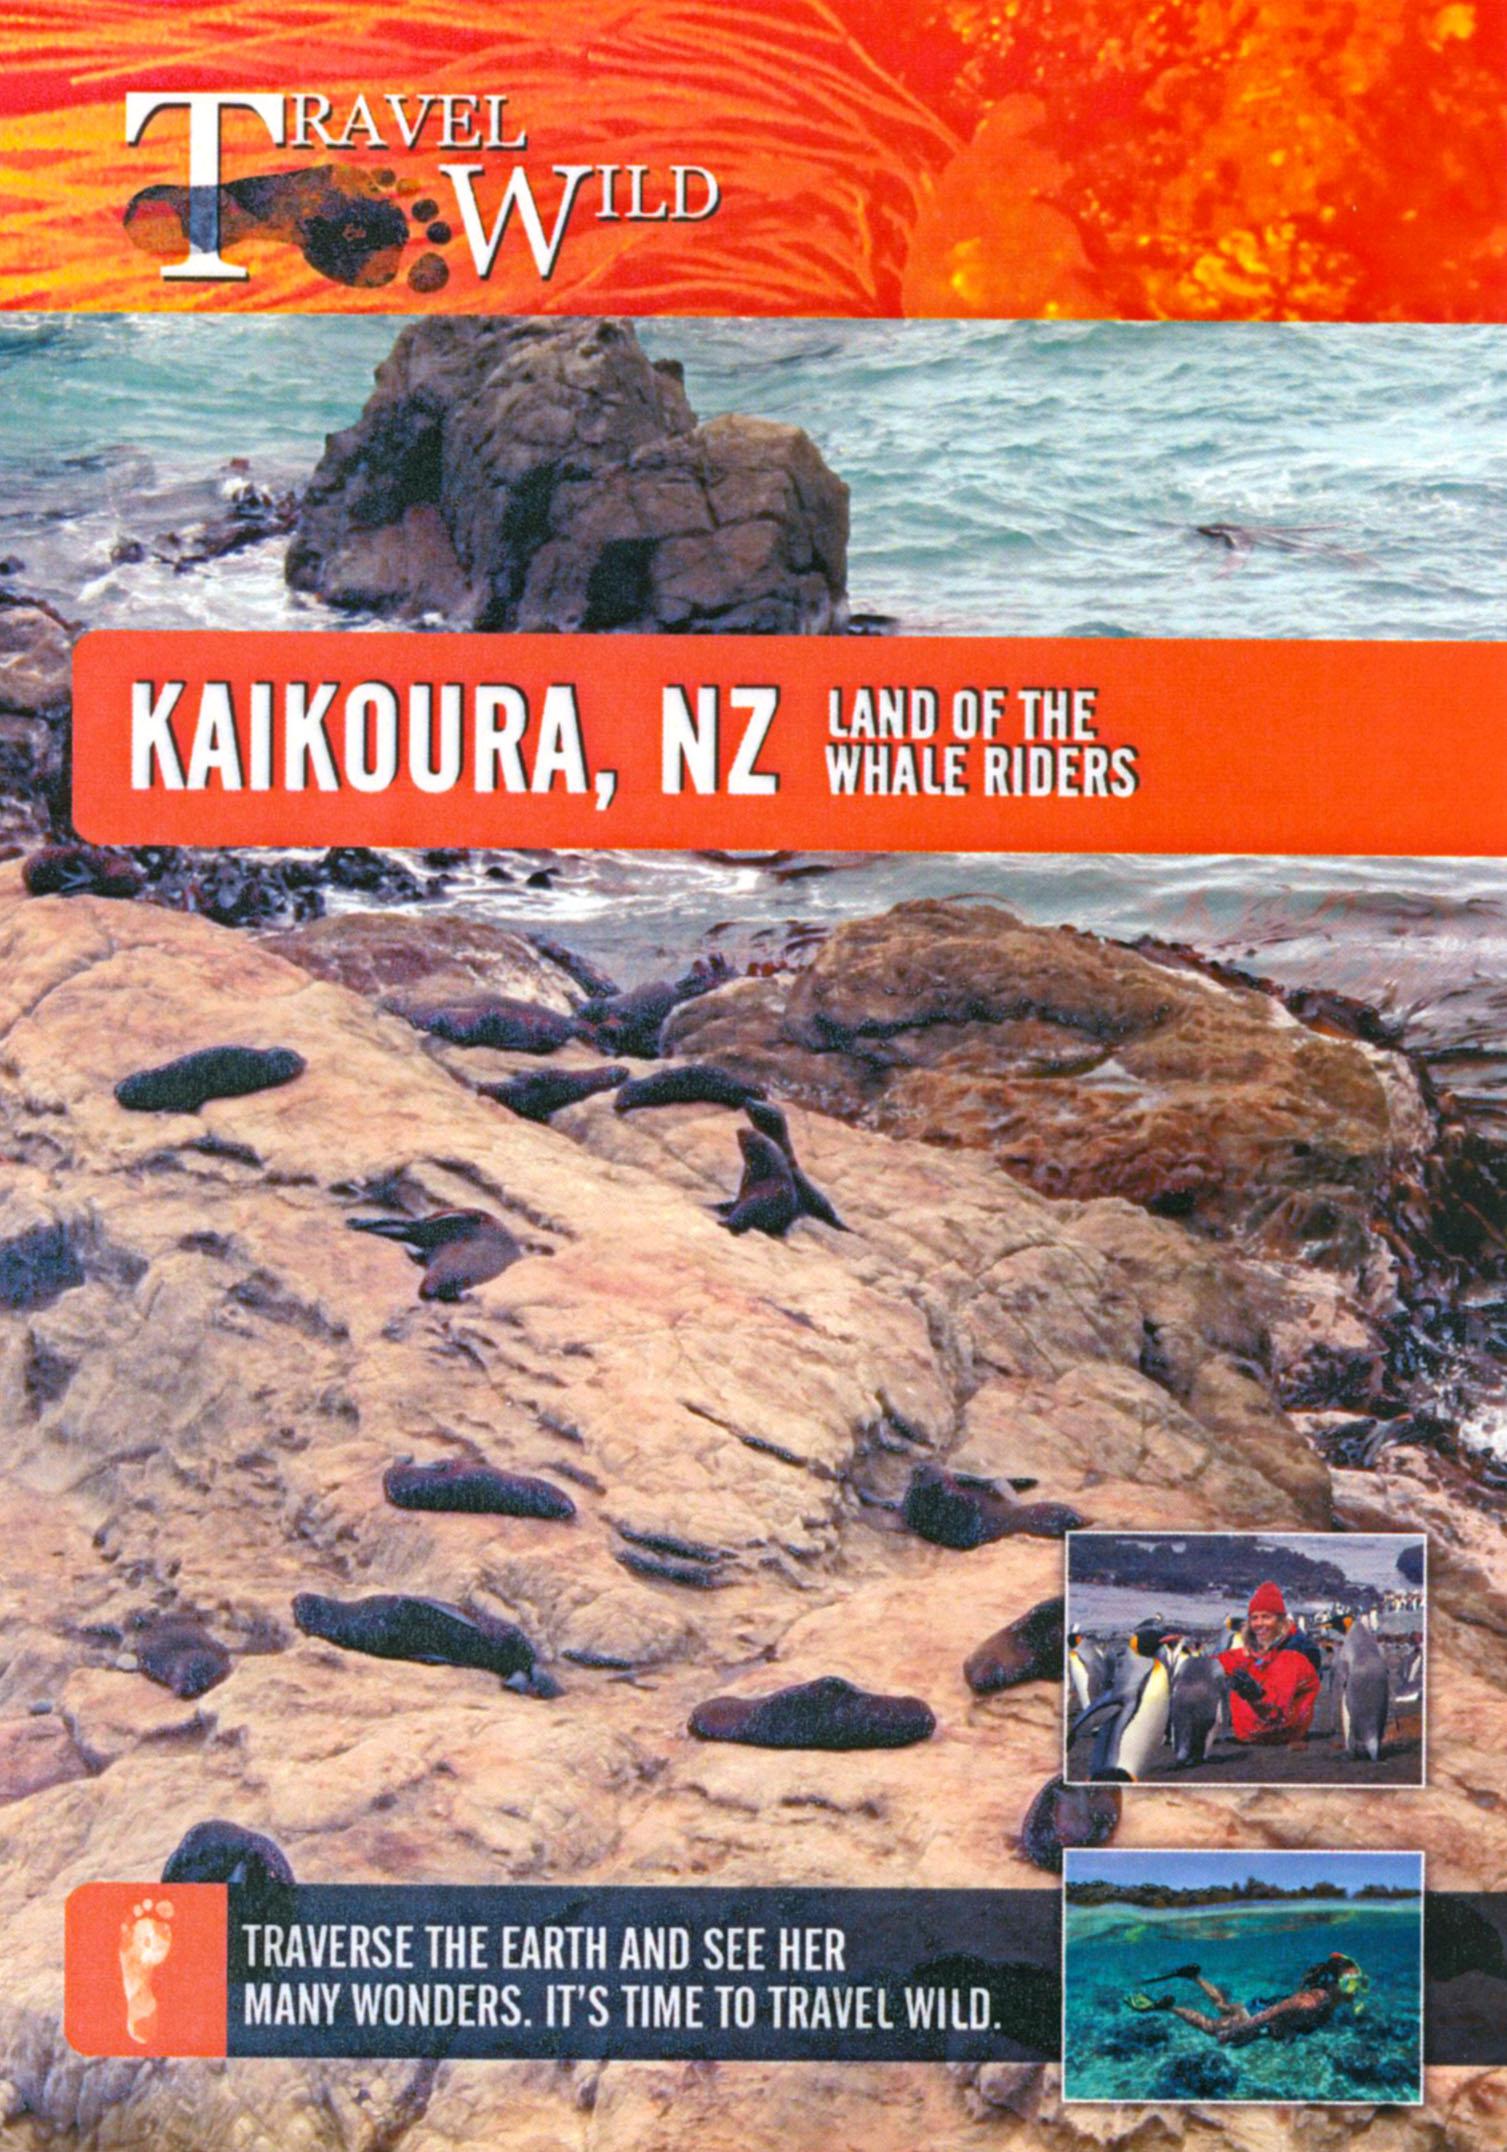 Travel Wild: Kaikoura, NZ - Land of the Whale Riders